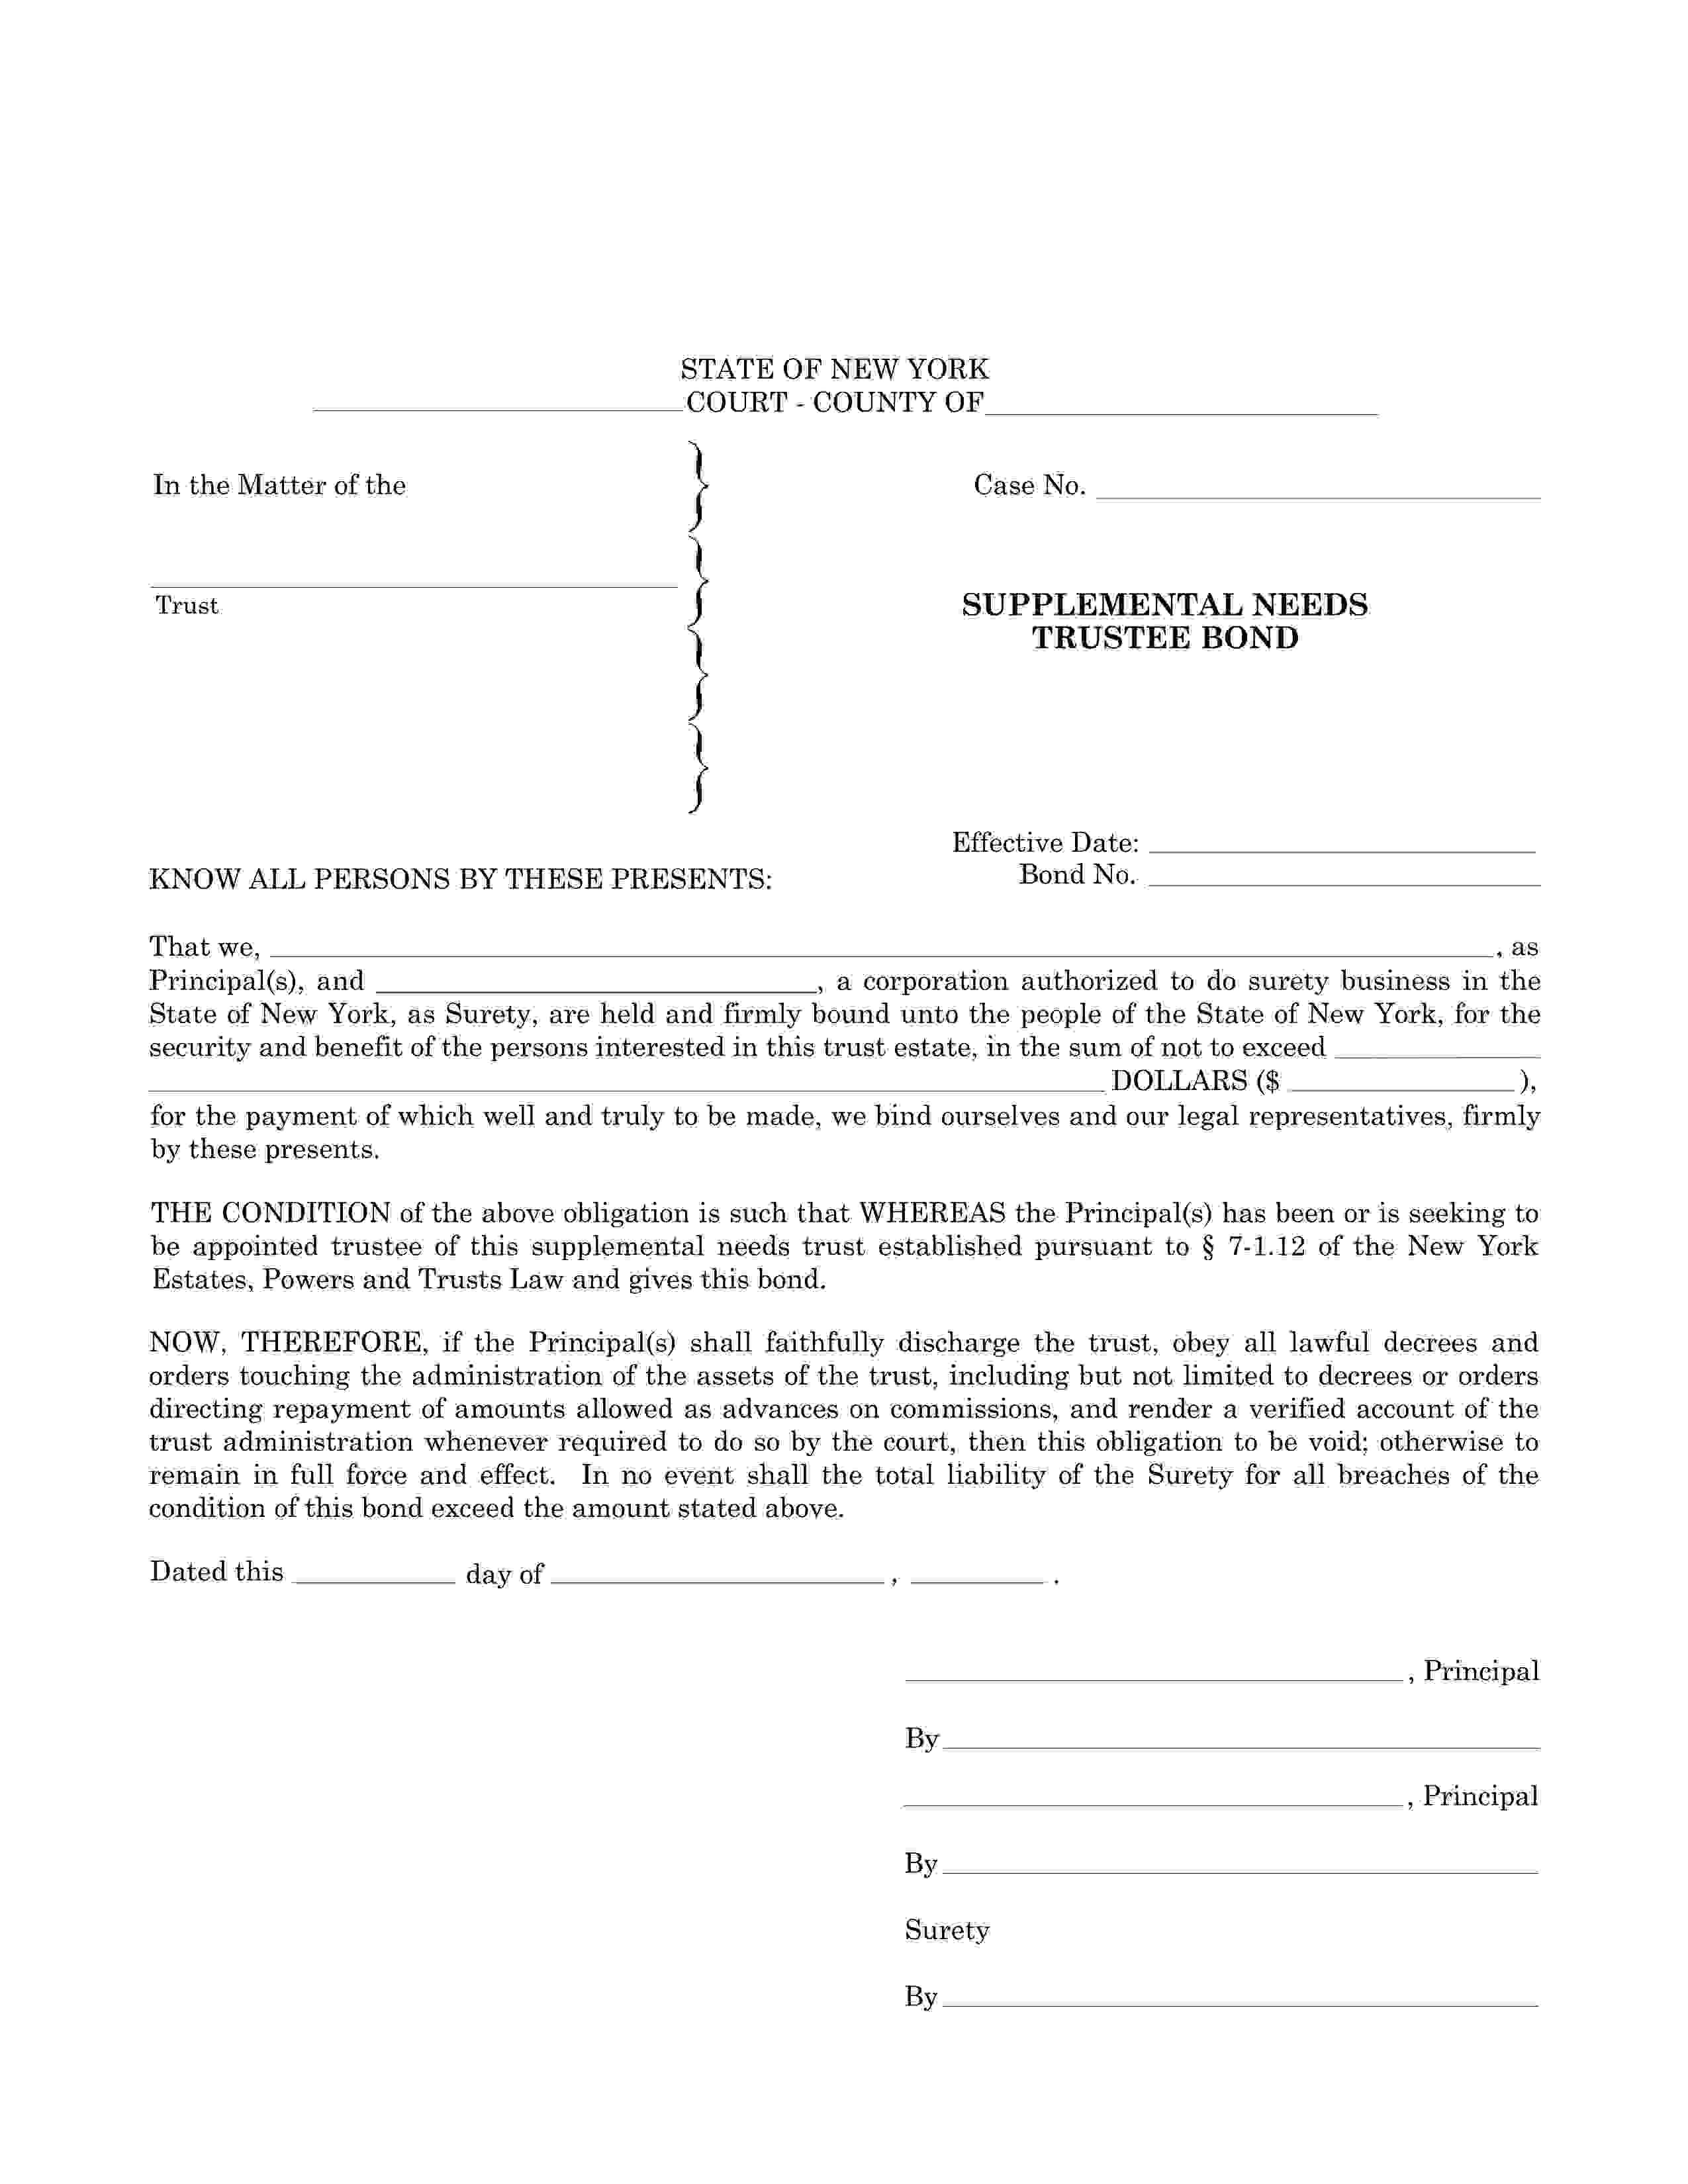 Supplemental Needs Trustee Bond sample image